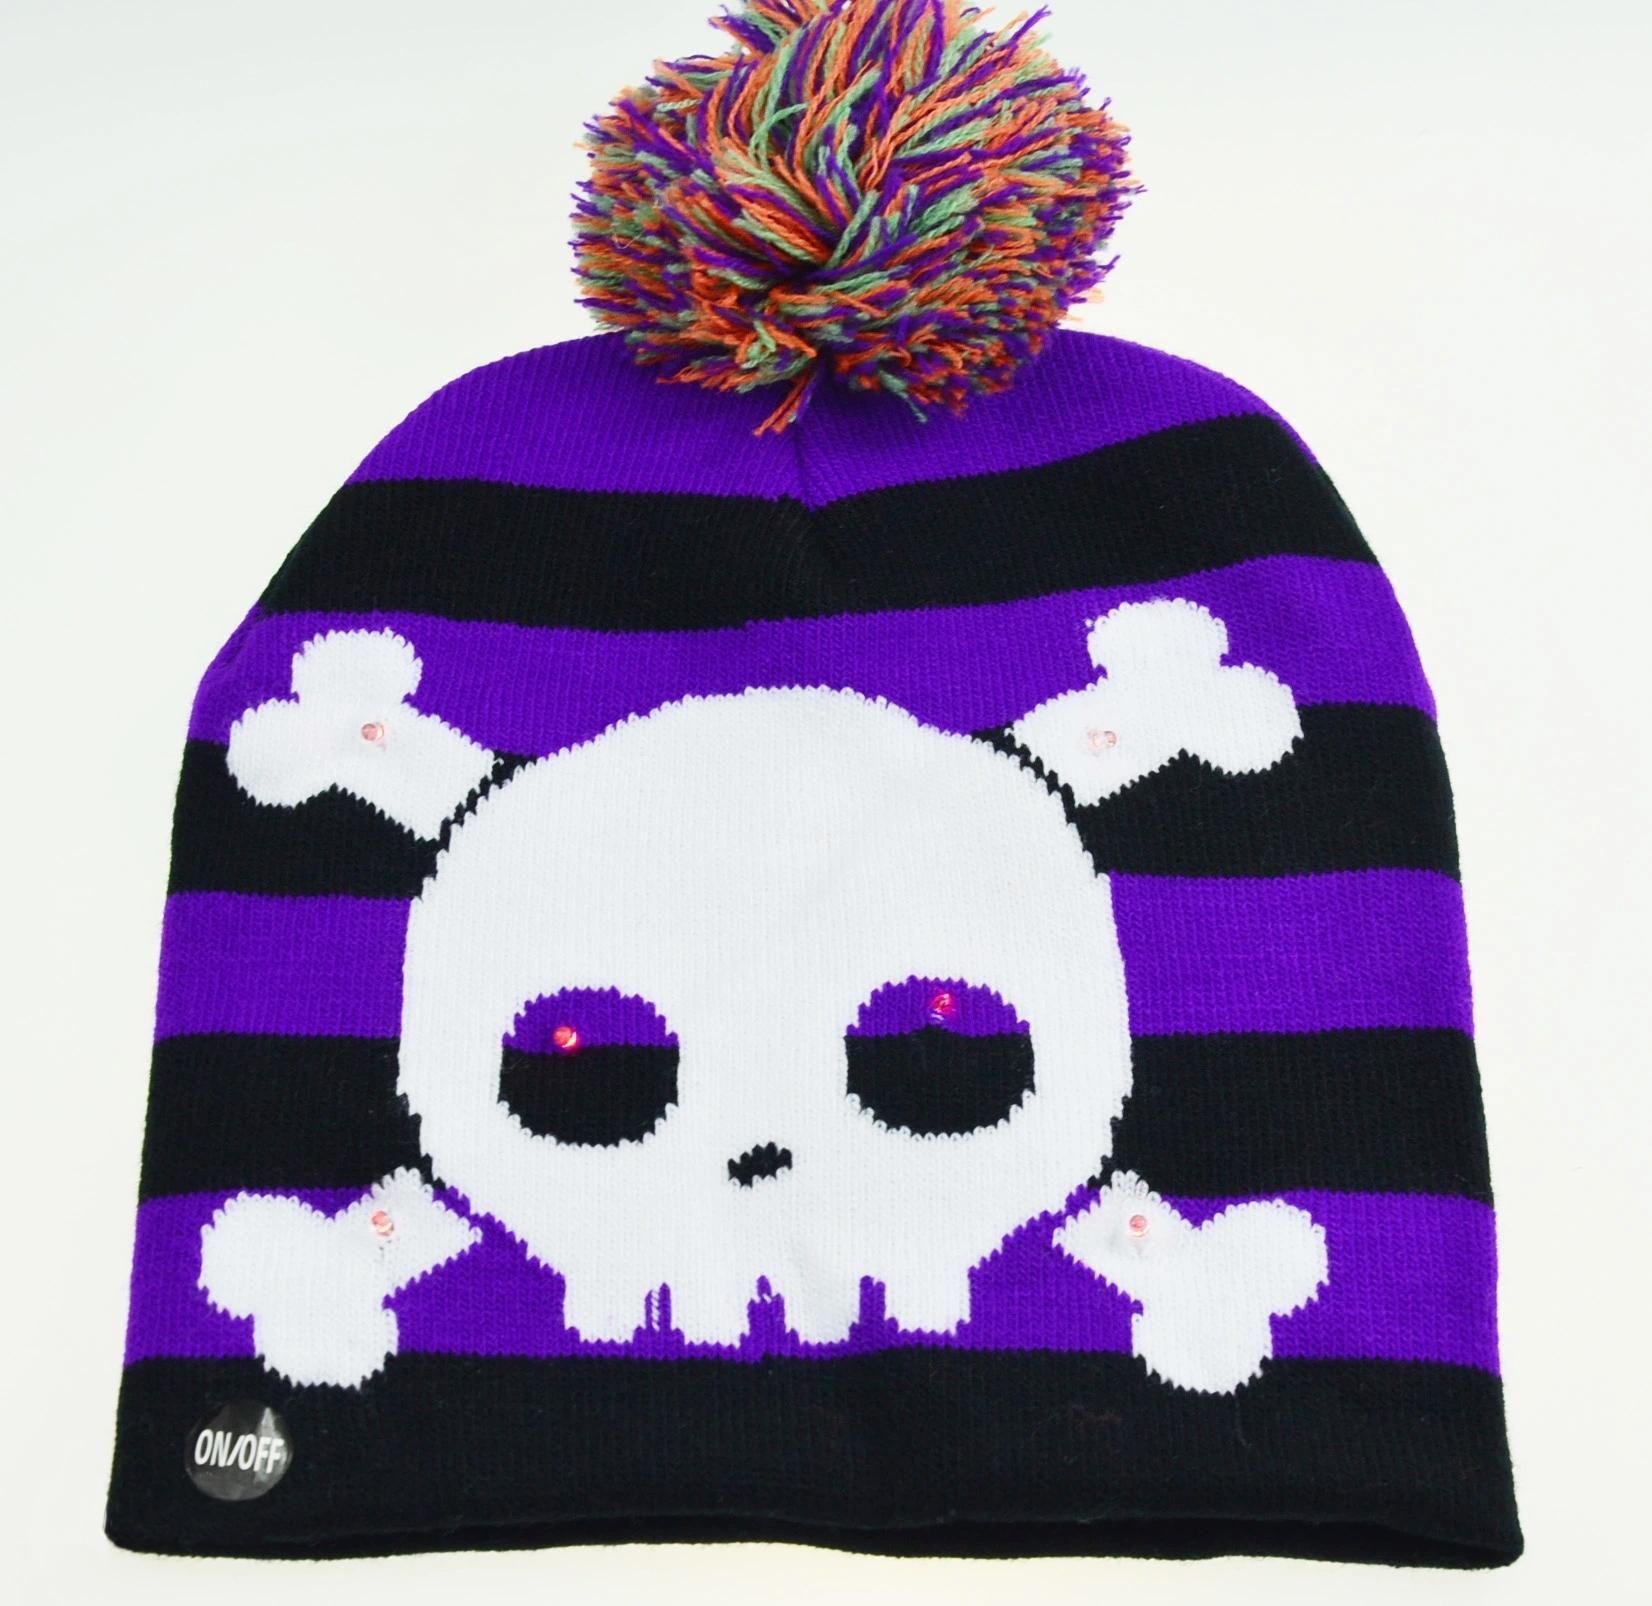 Holiday Custom Led Knitted Hat/ Led Beanie Hat/ Led Winter Gorros Hat 4